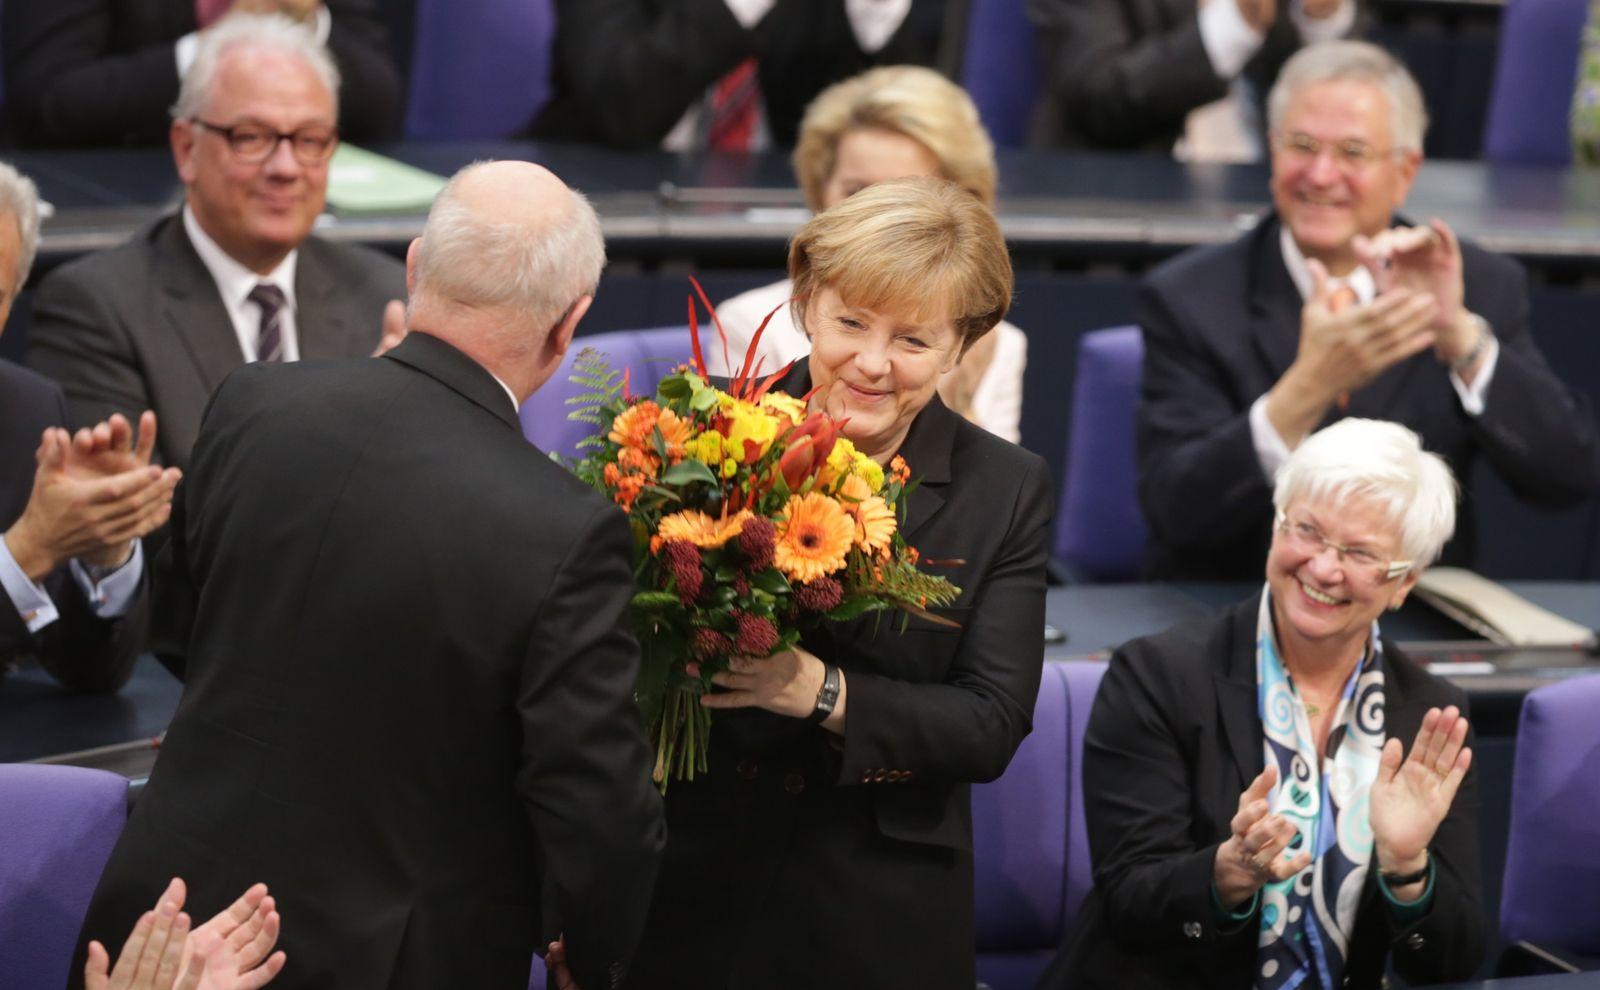 Merkel / Kanzlerwahl / Vereidigung #9